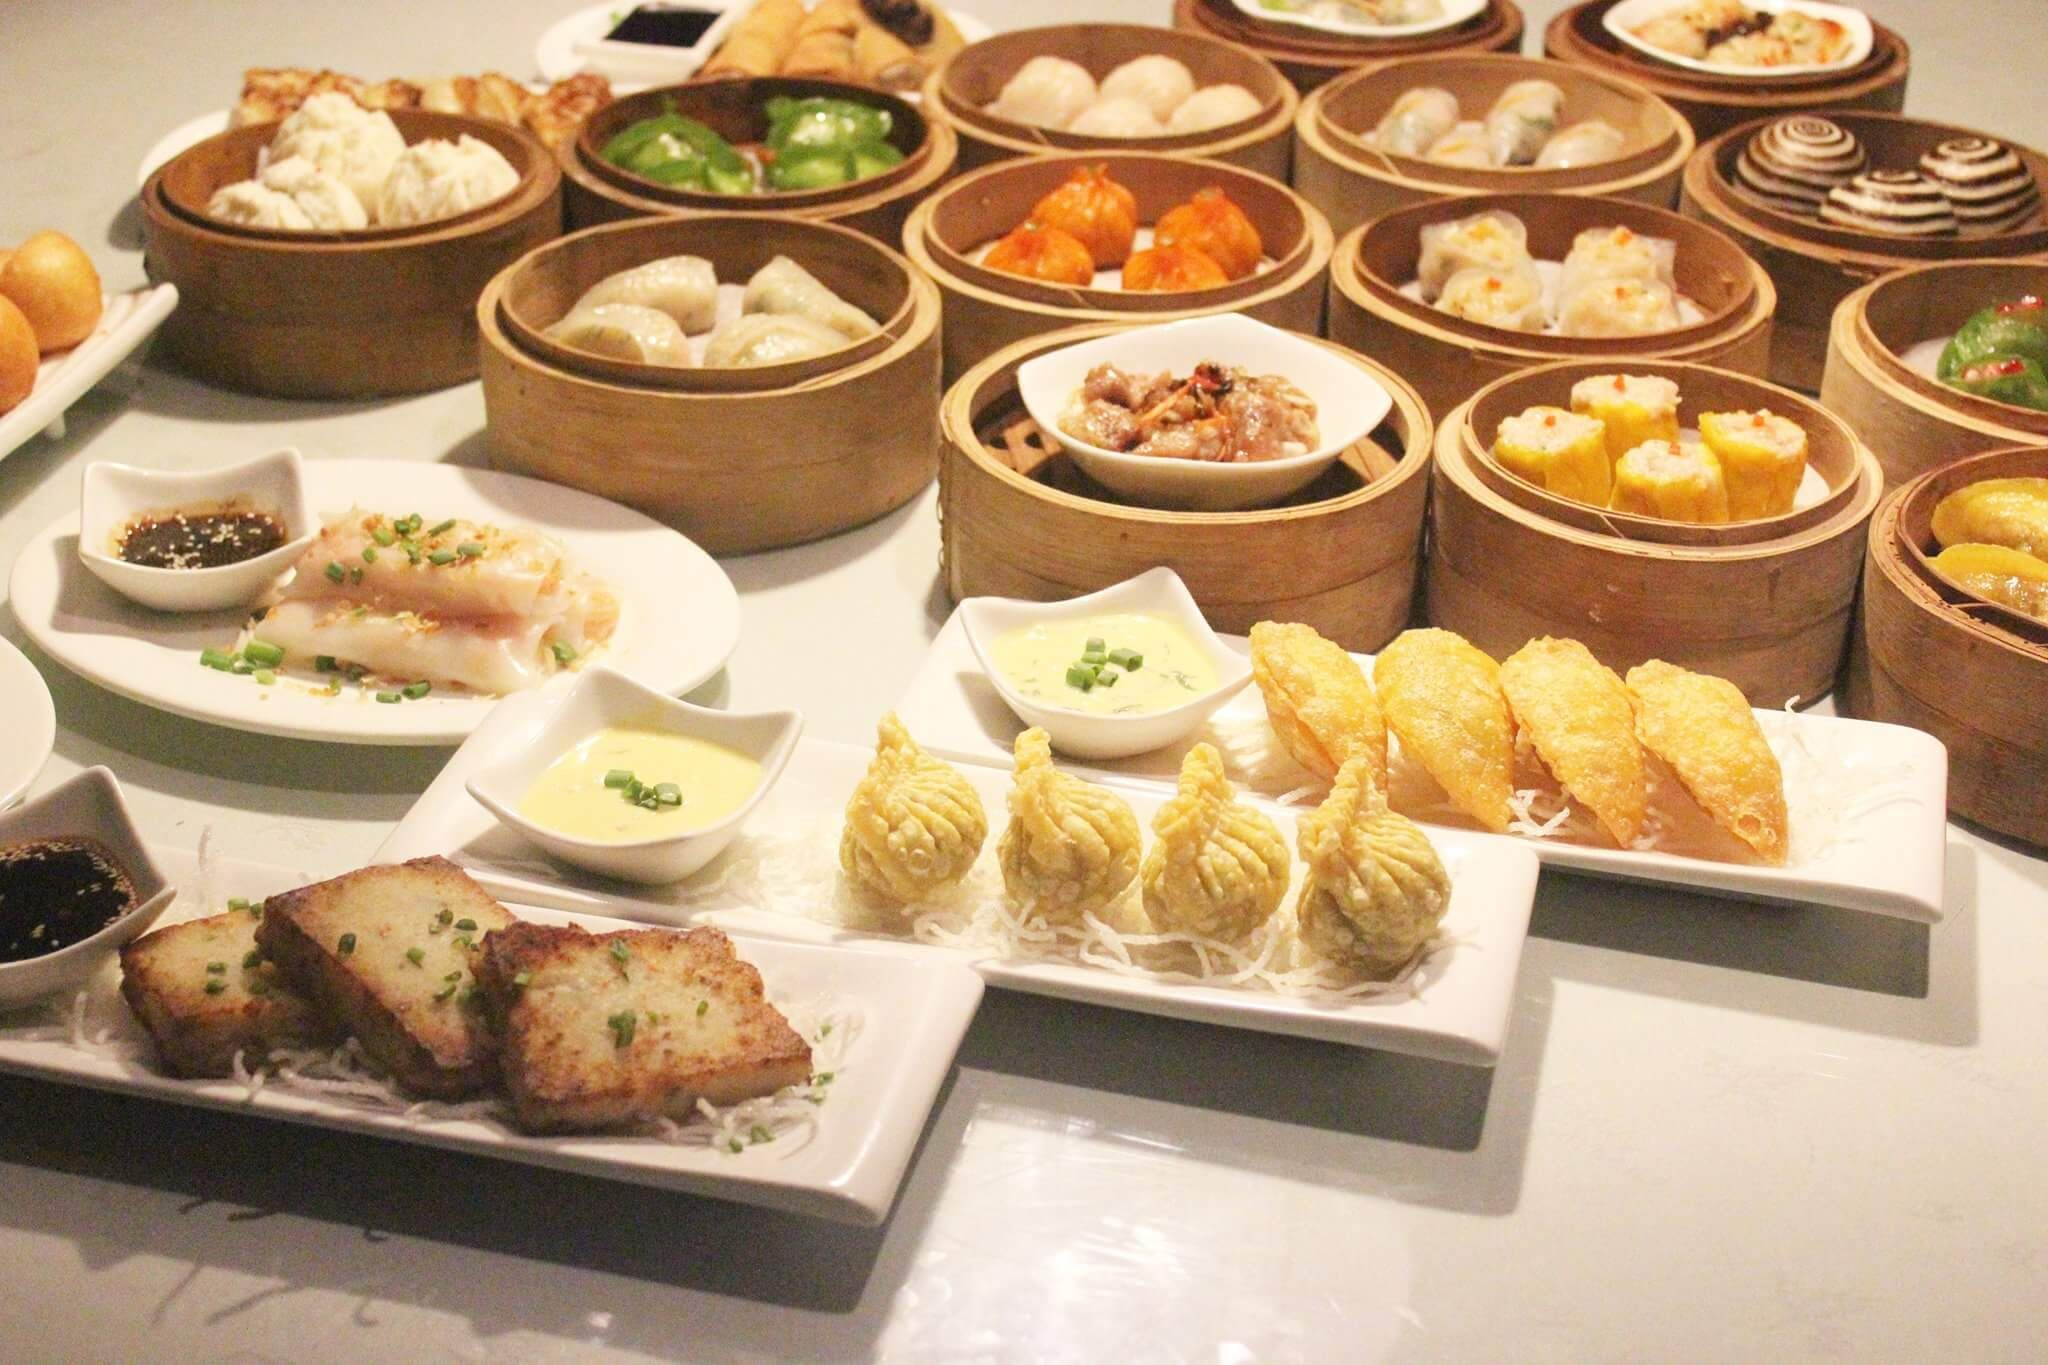 China Garden Restaurant Vegan Restaurants Dessert Restaurants Restaurant Offers